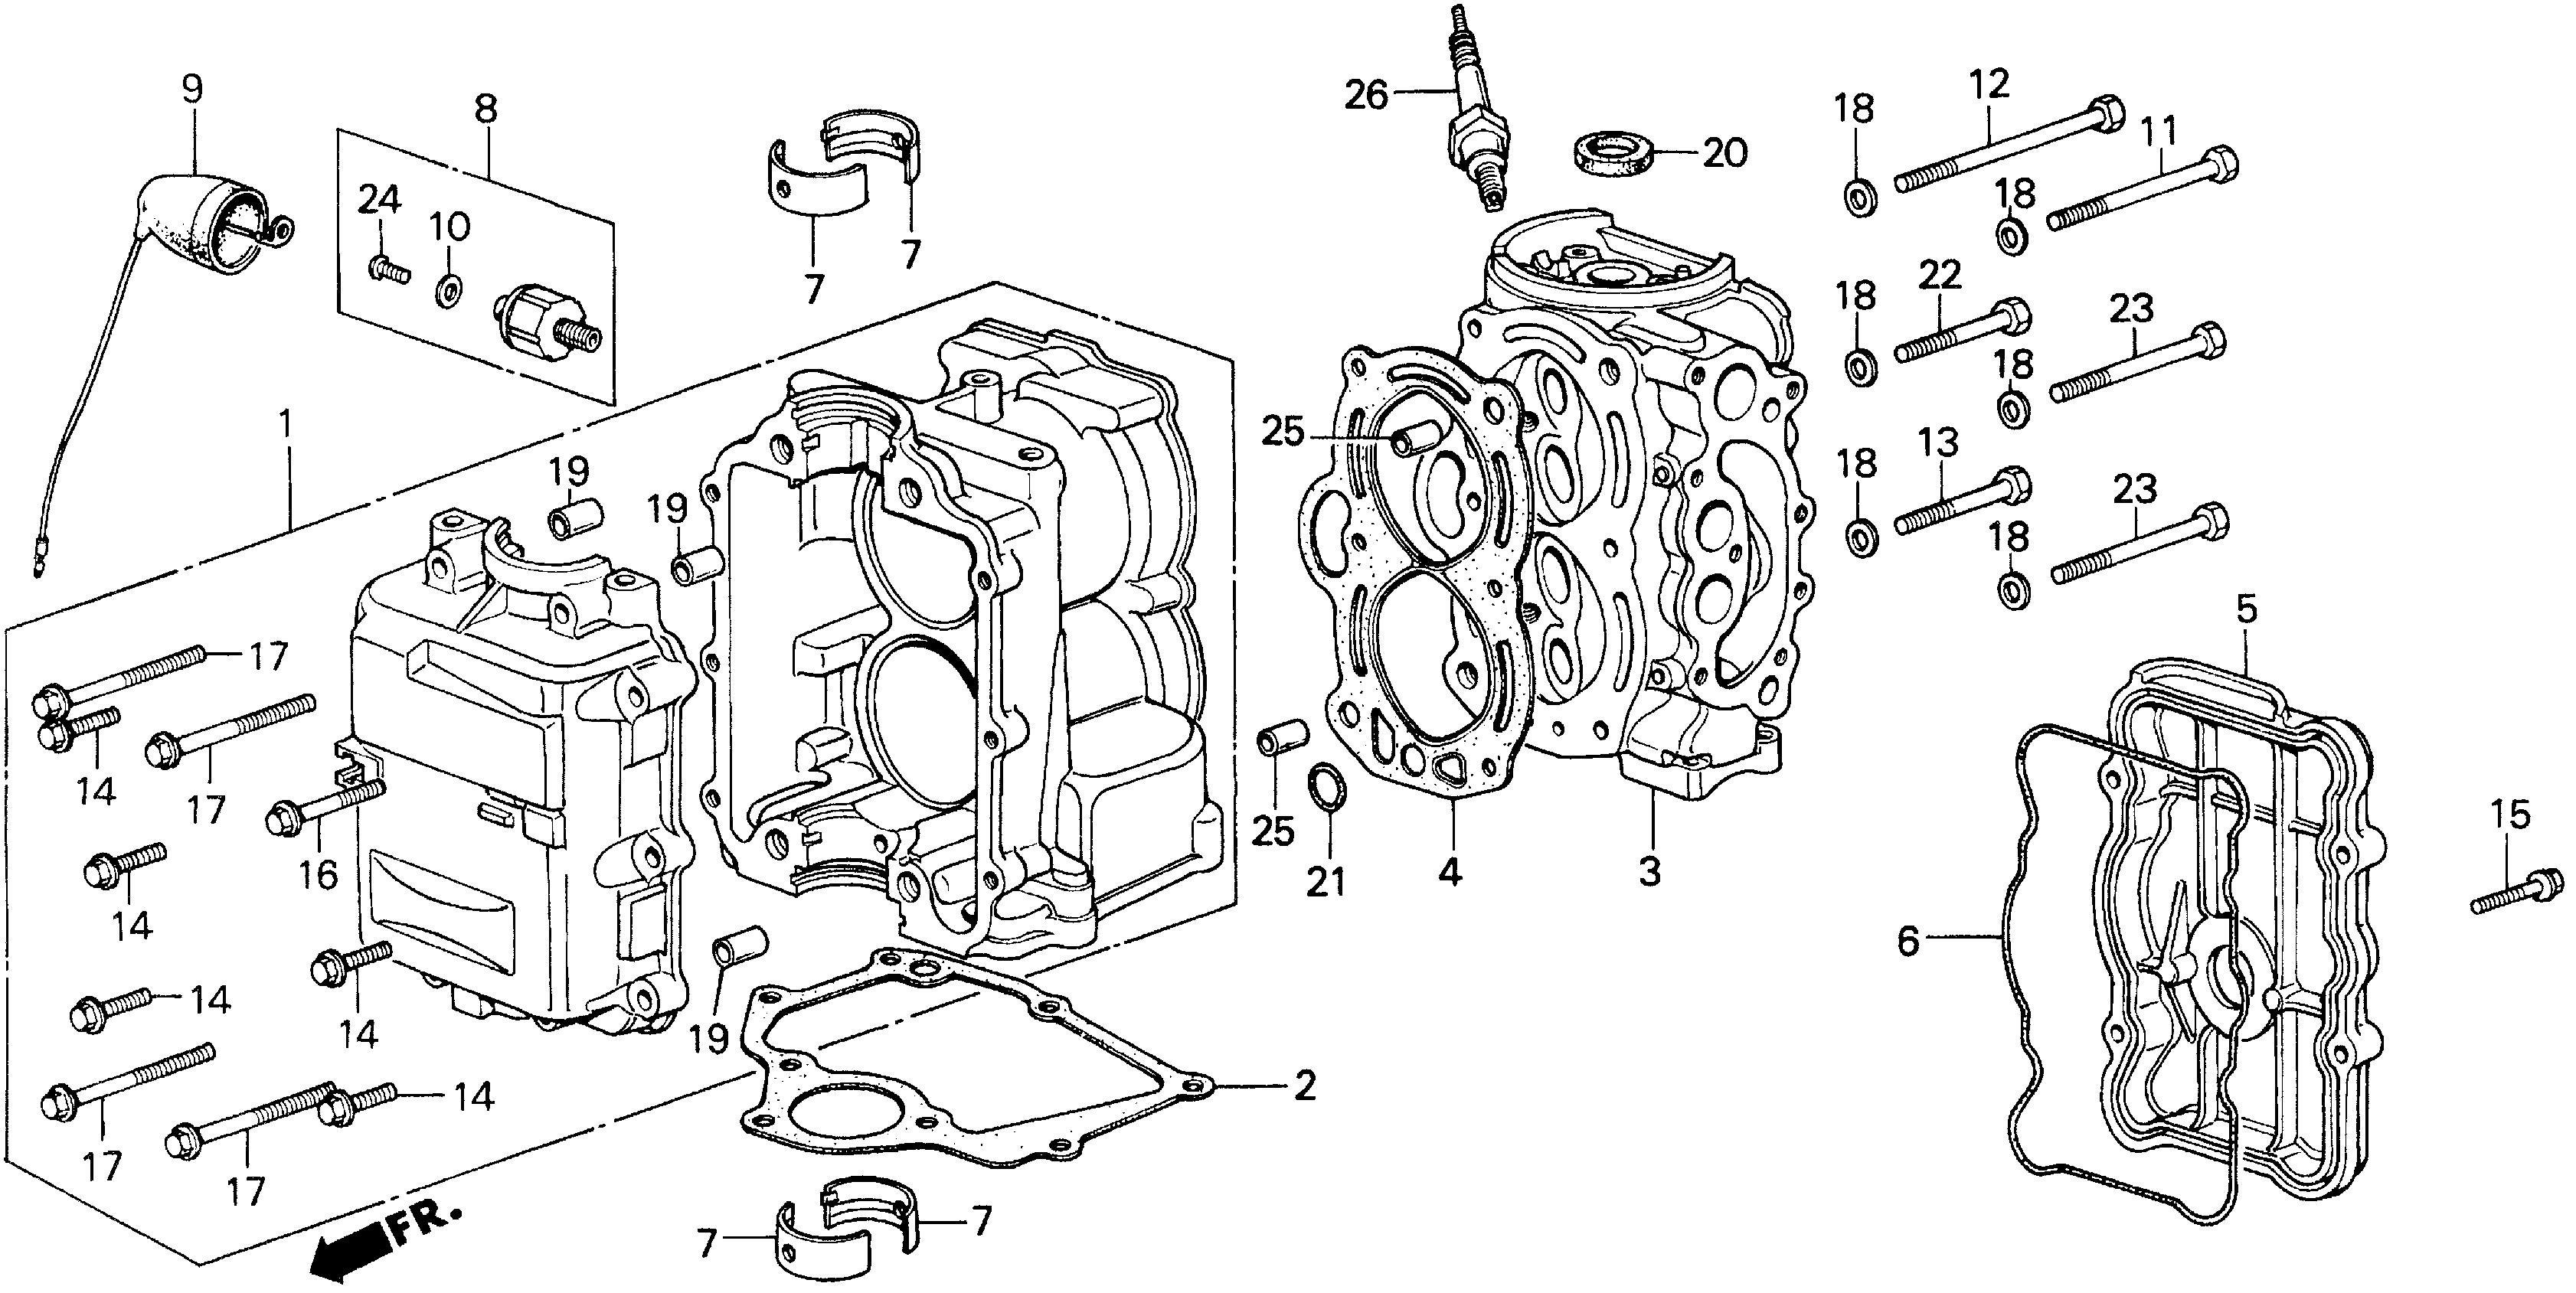 Honda Engine Parts Diagram Honda Marine Parts Look Up Ficial Site Of Honda Engine Parts Diagram